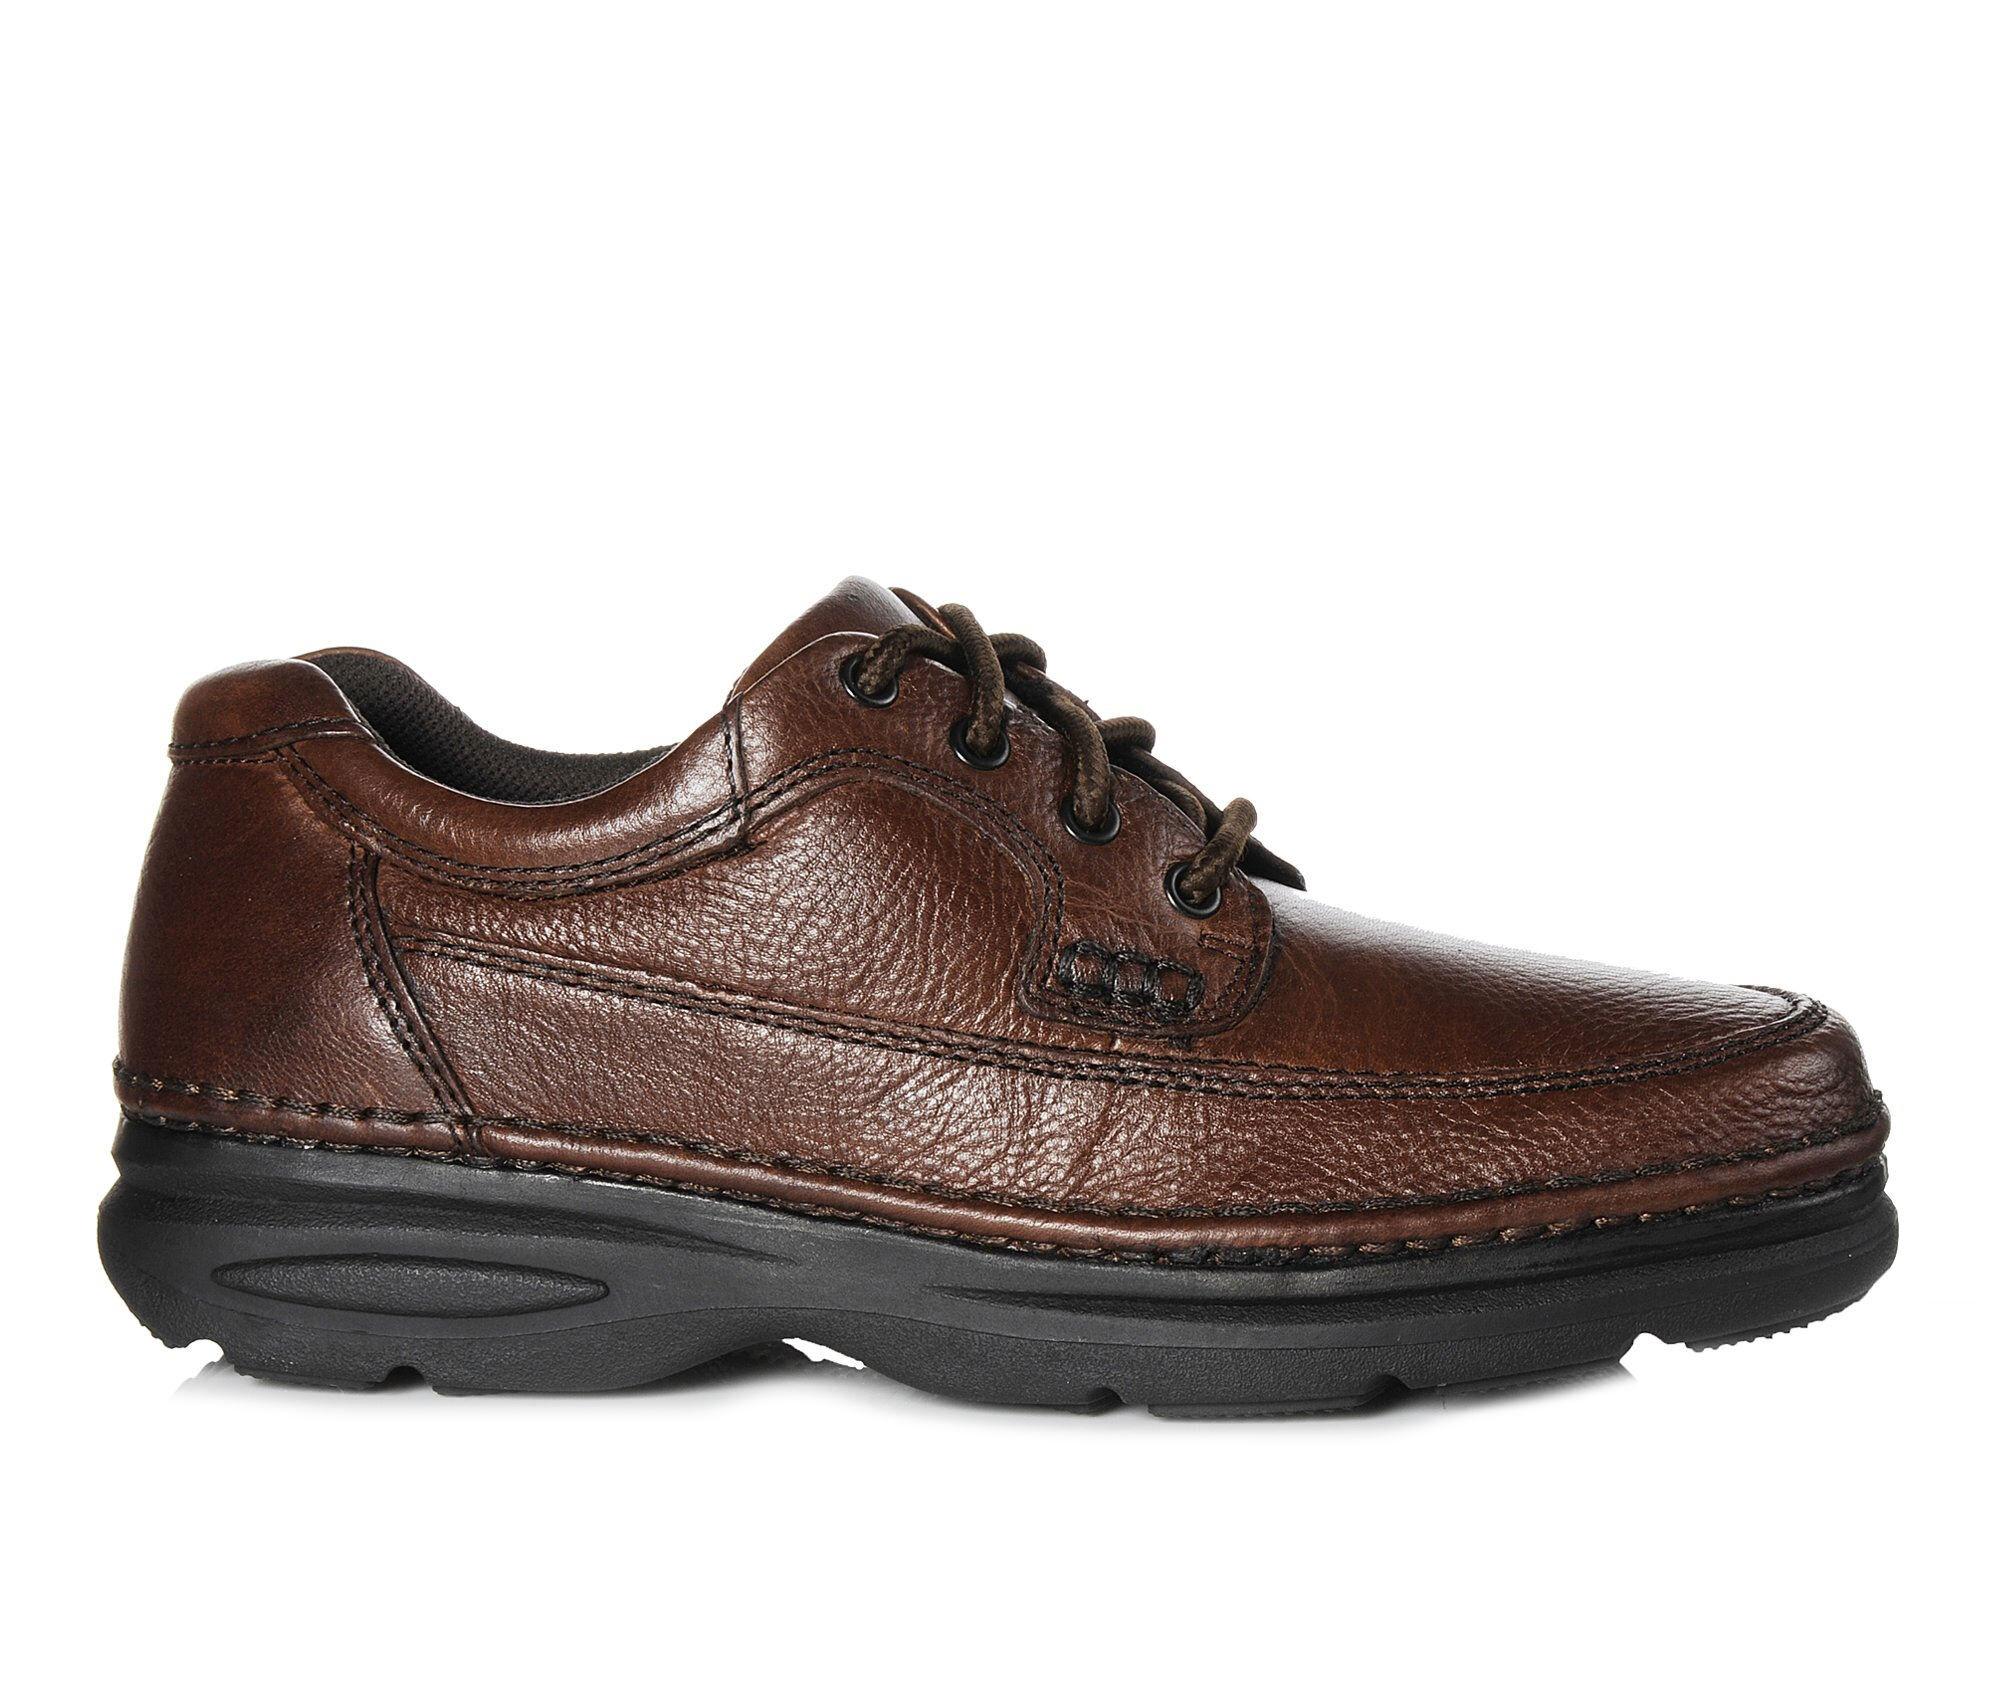 Nunn Bush Cameron Men's Casual ... Oxford Shoes ASQQs6iS